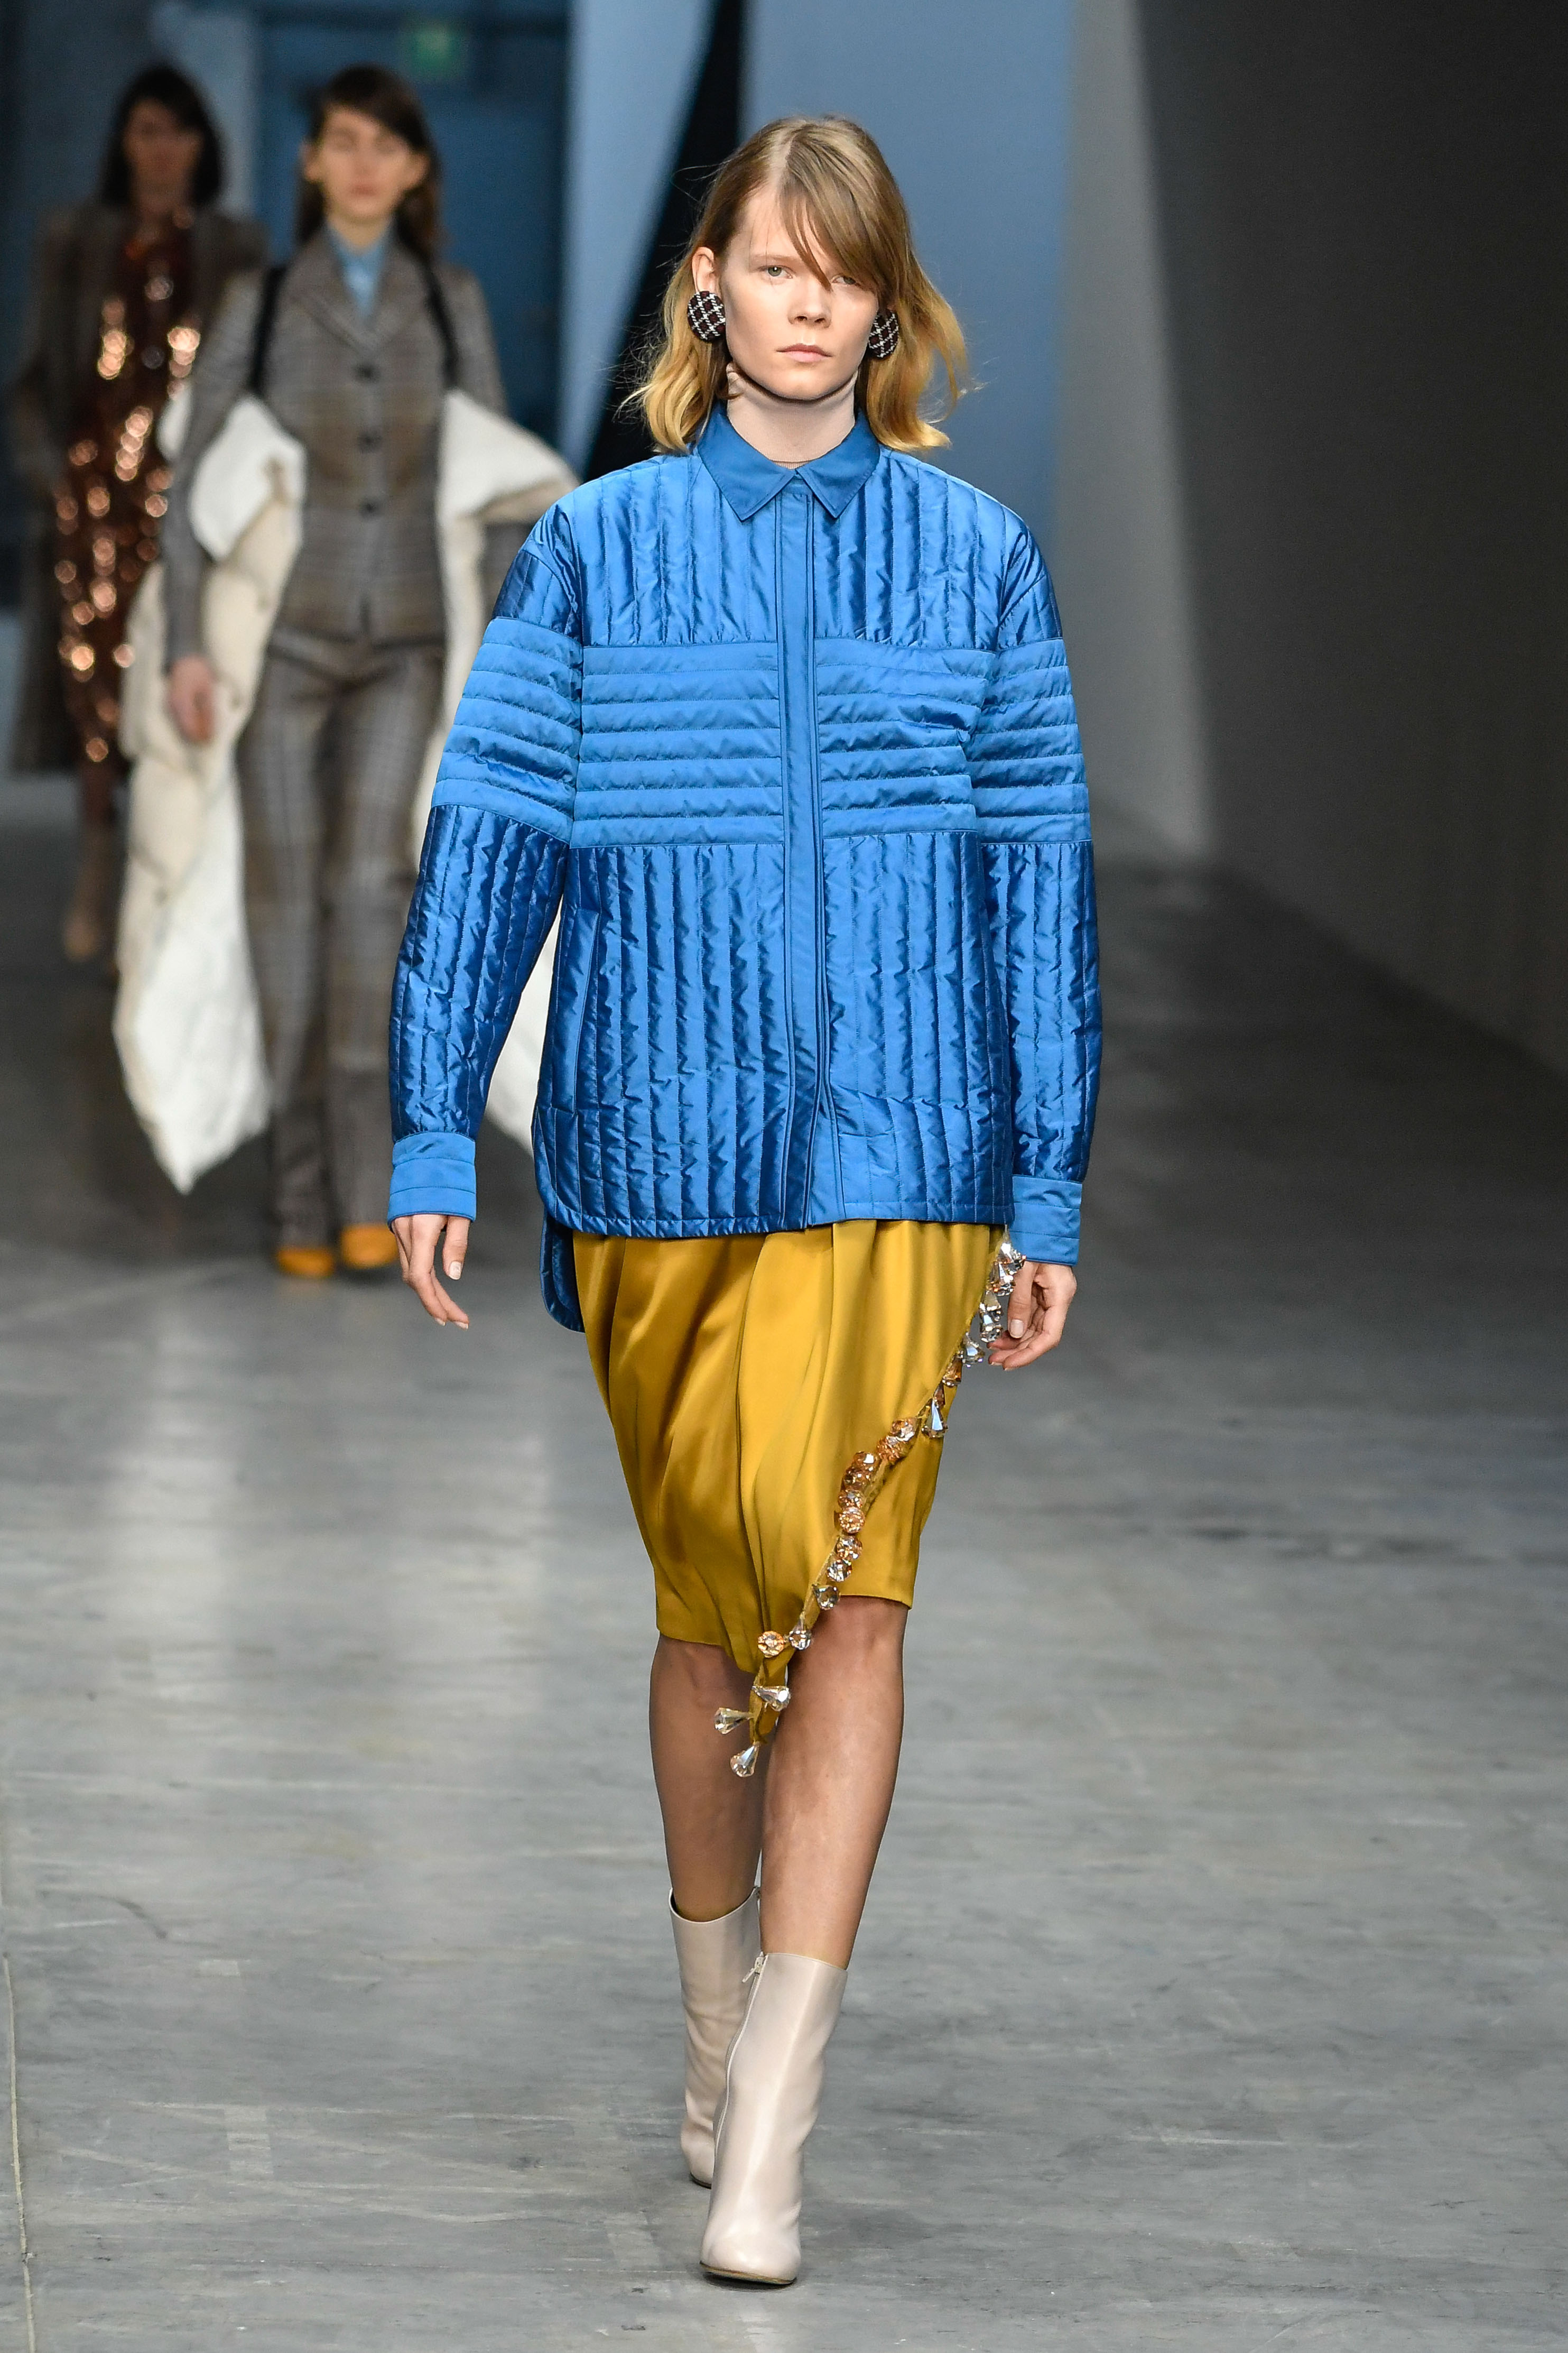 Milan Fashion Week Schedule Fashion Week Online 49